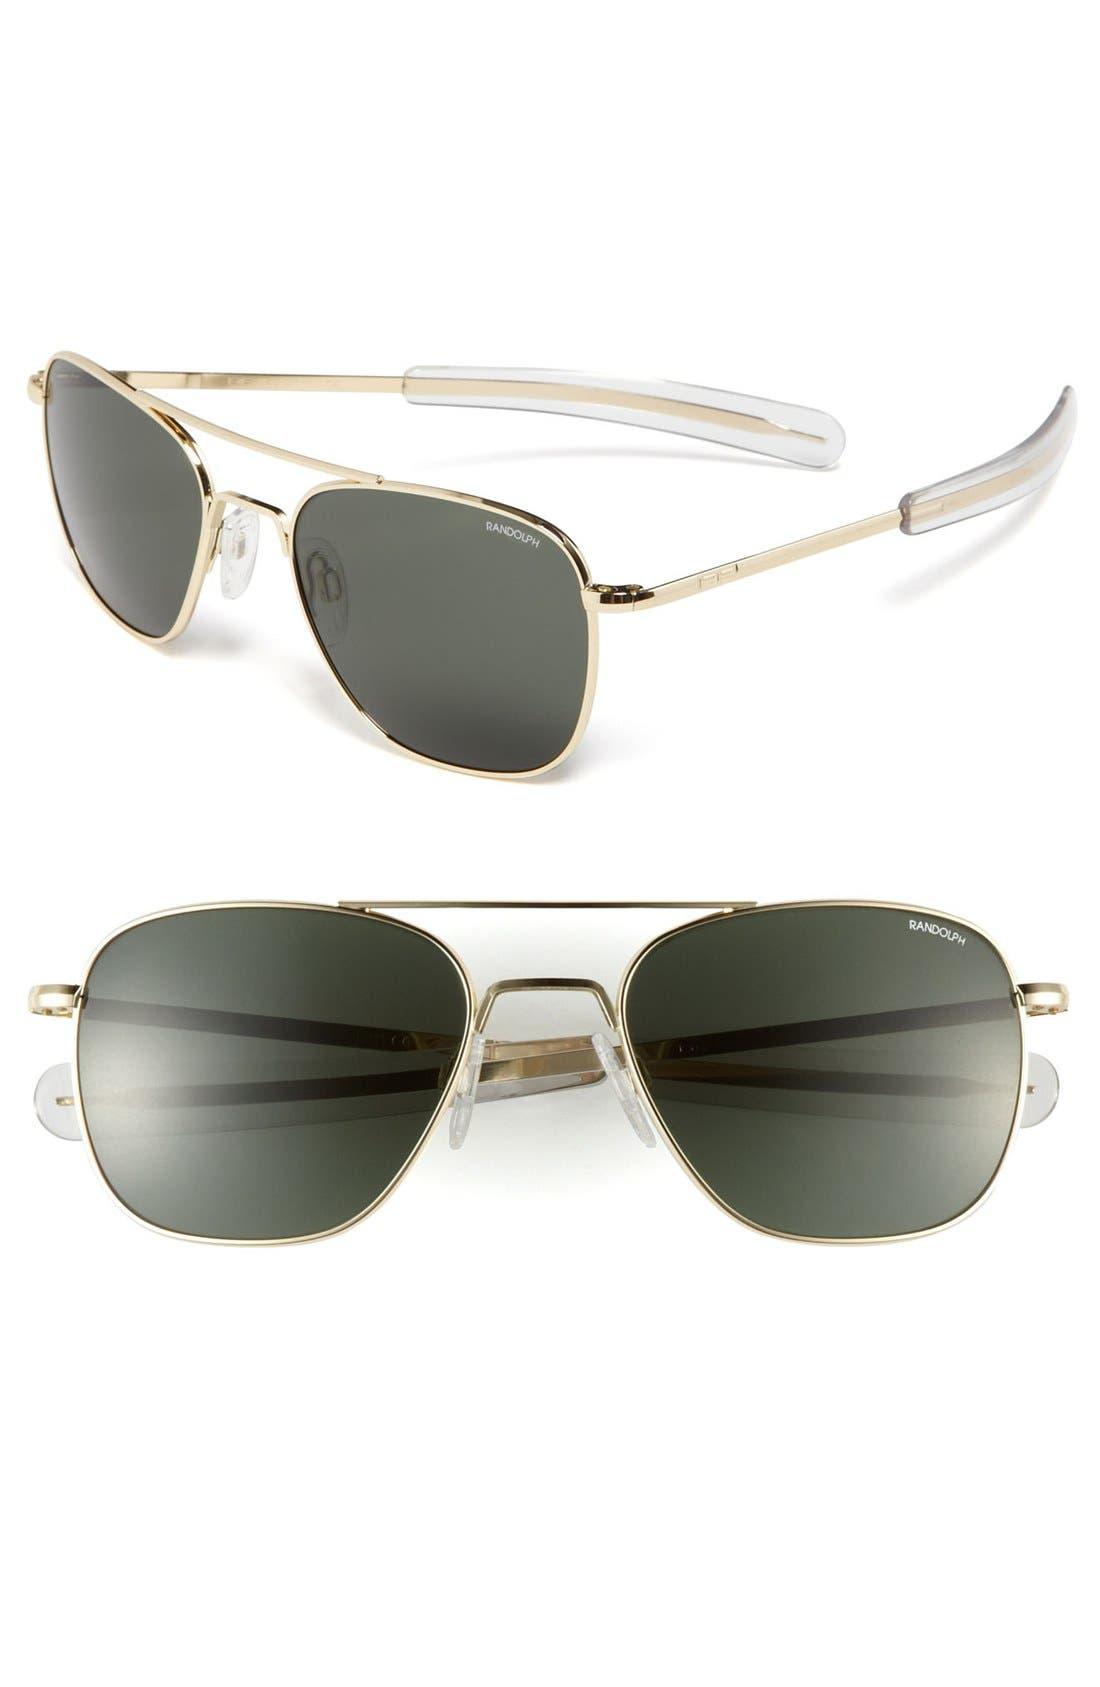 55mm Aviator Sunglasses,                         Main,                         color, 711